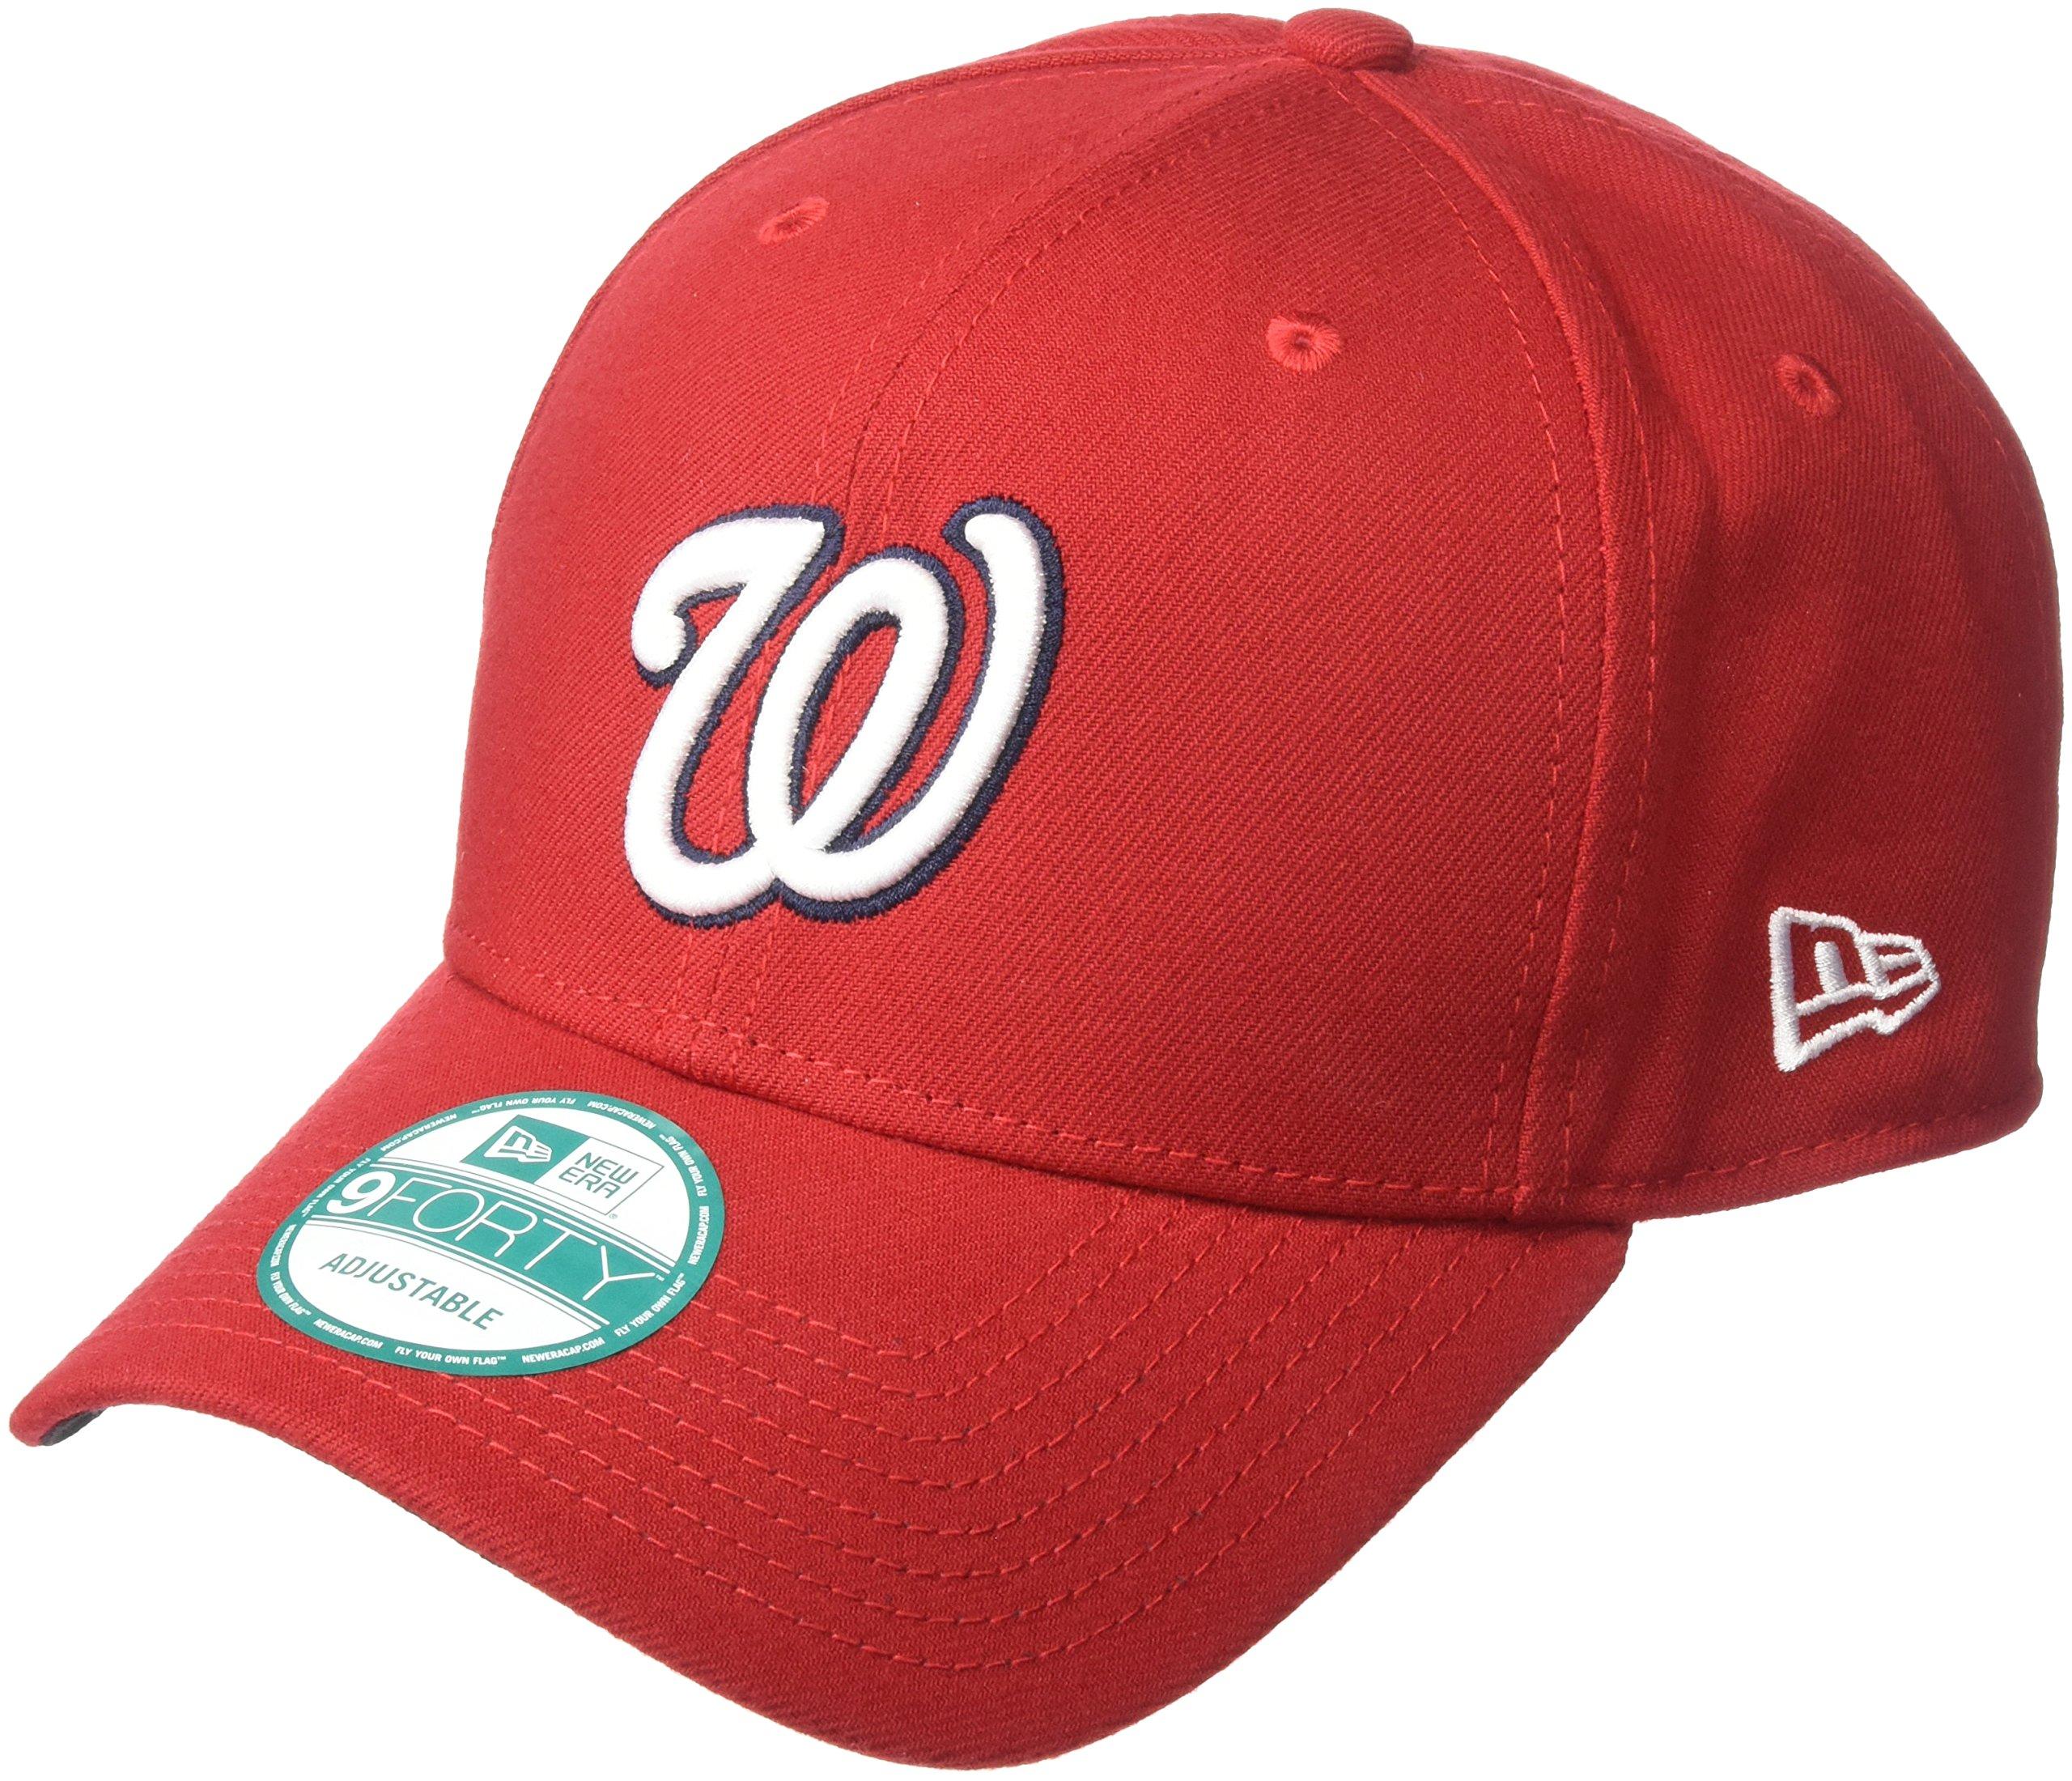 official photos 26598 b3c0f New Era MLB The League Washington Nationals Game 9Forty Adjustable Cap,  Scarlet, Baseball Caps - Amazon Canada